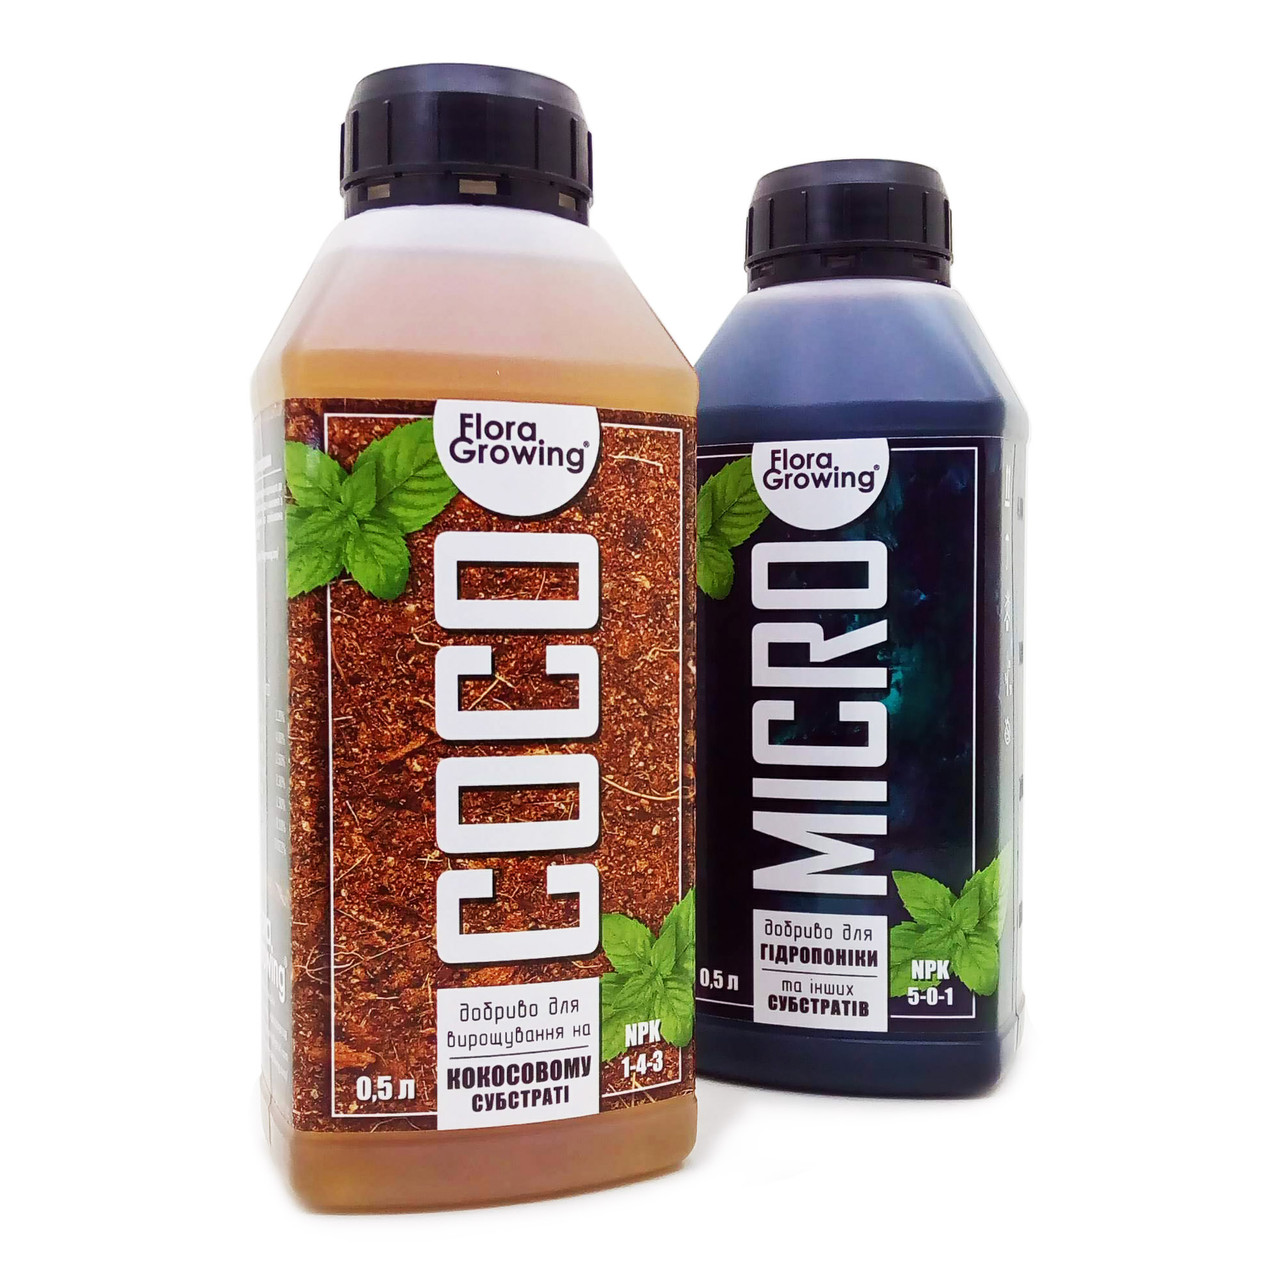 2 х 500 мл Coco Kit - Комплект удобрений для выращивания в кокосовом субстрате (аналог Canna COCO)